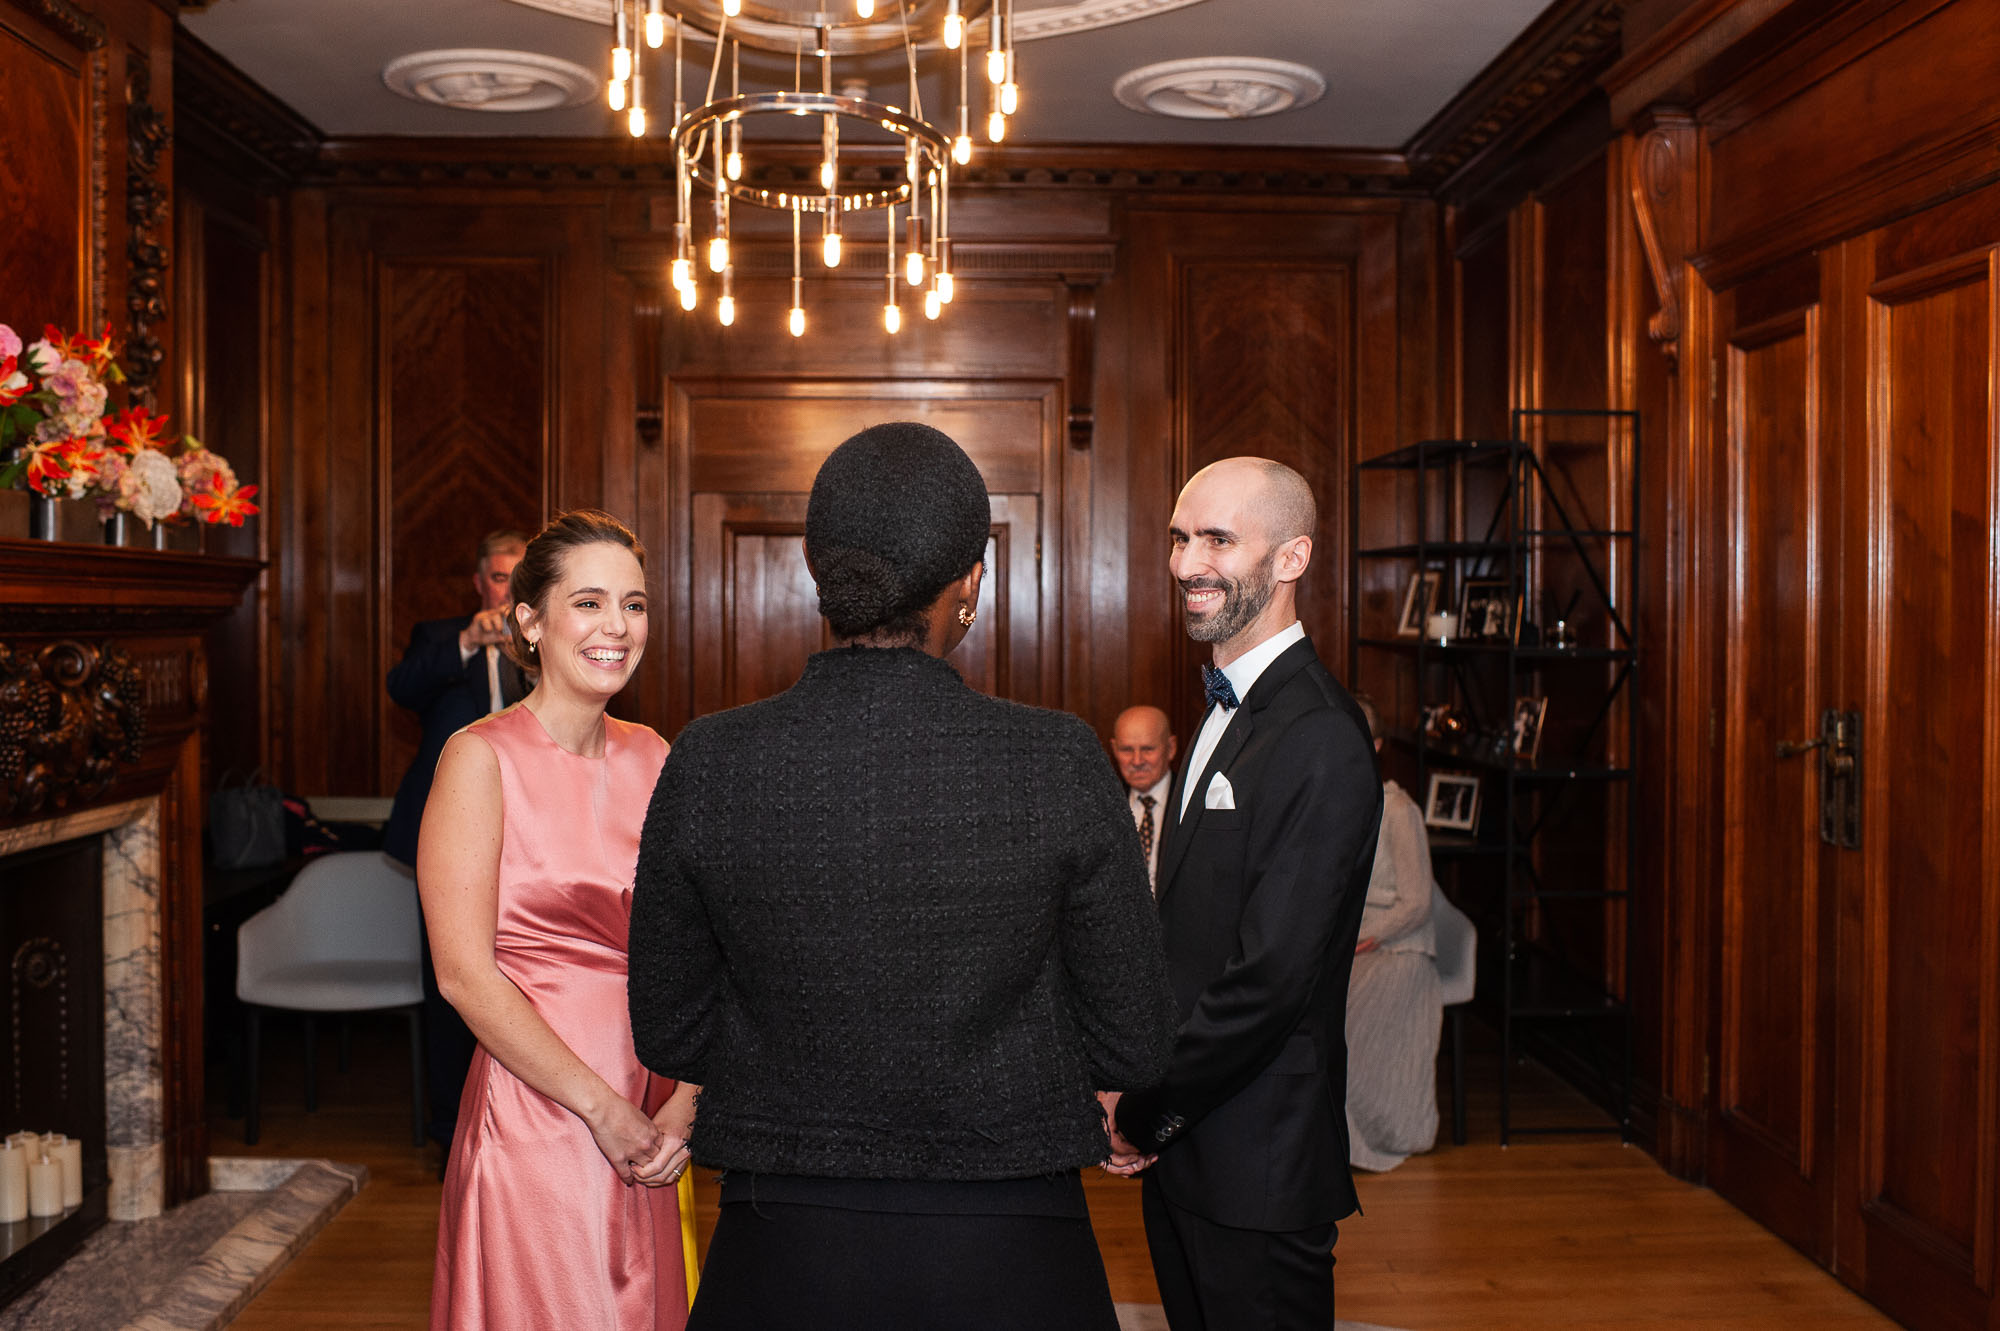 Our Wedding_HR (122 of 176).jpg